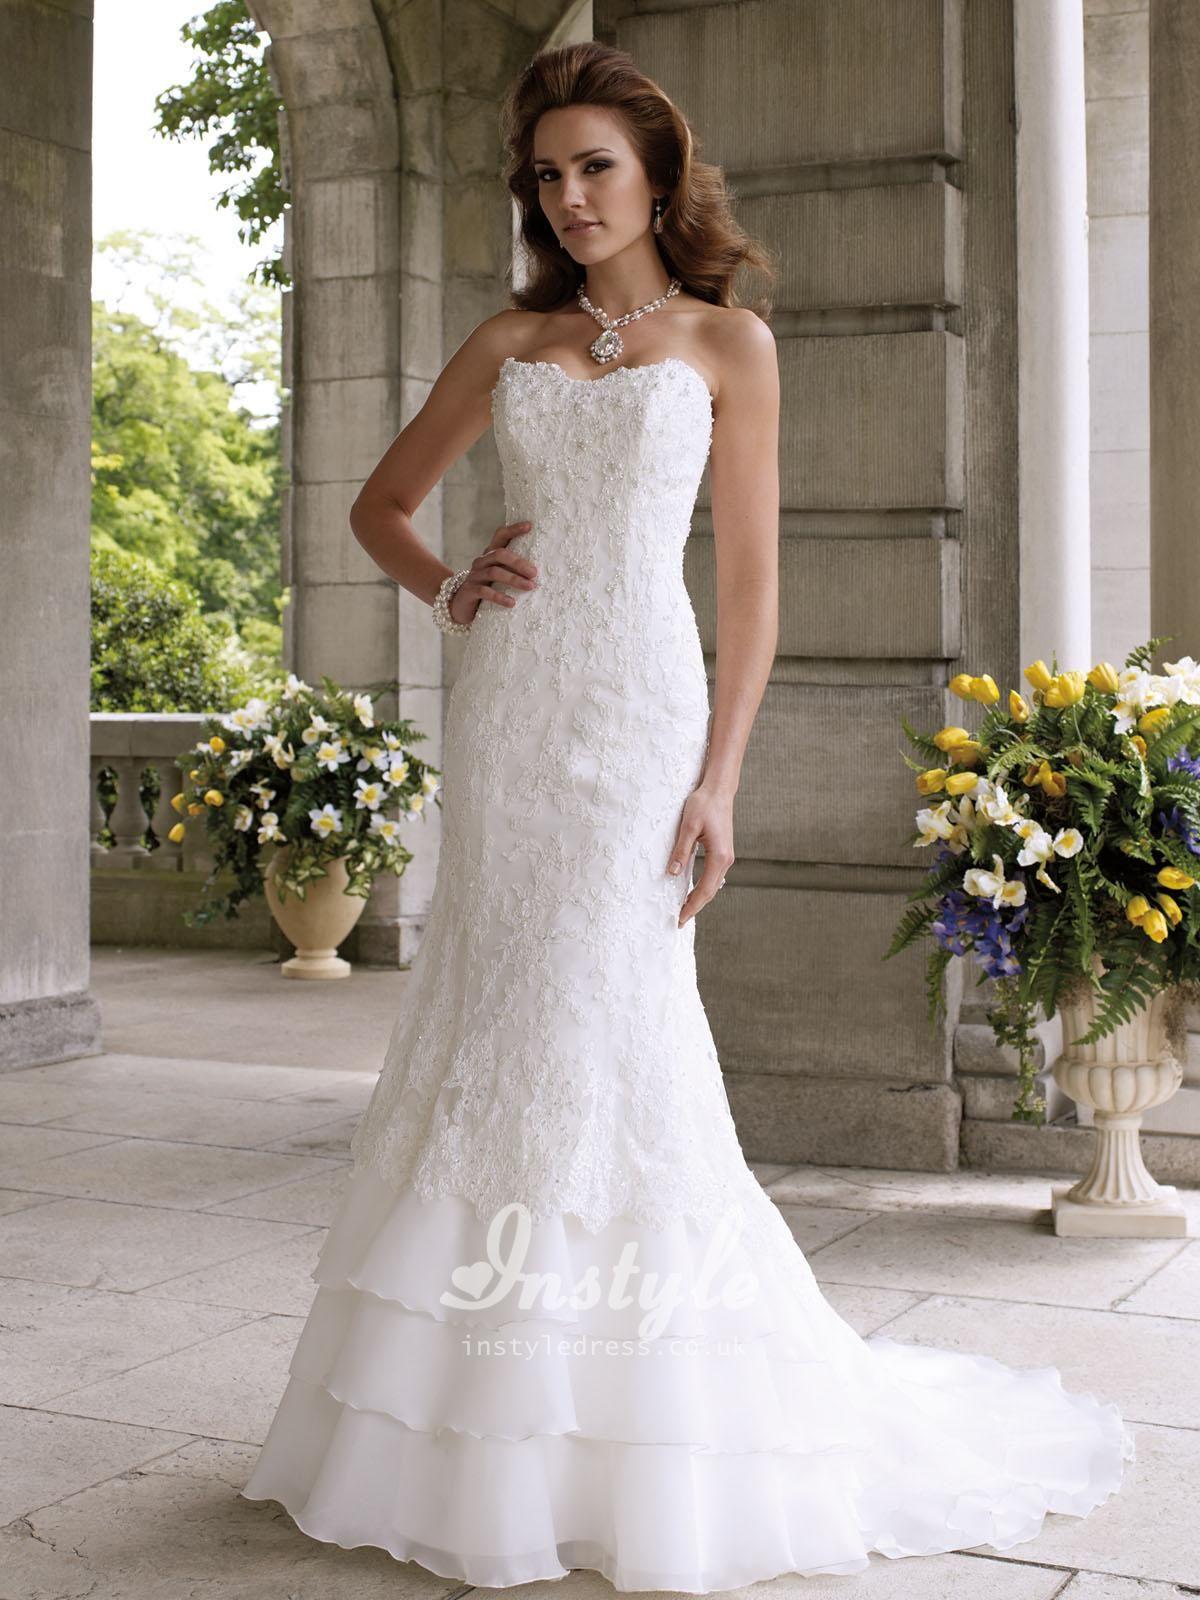 Vintage Strapless Slim Aline Beaded Lace Wedding Dress UK